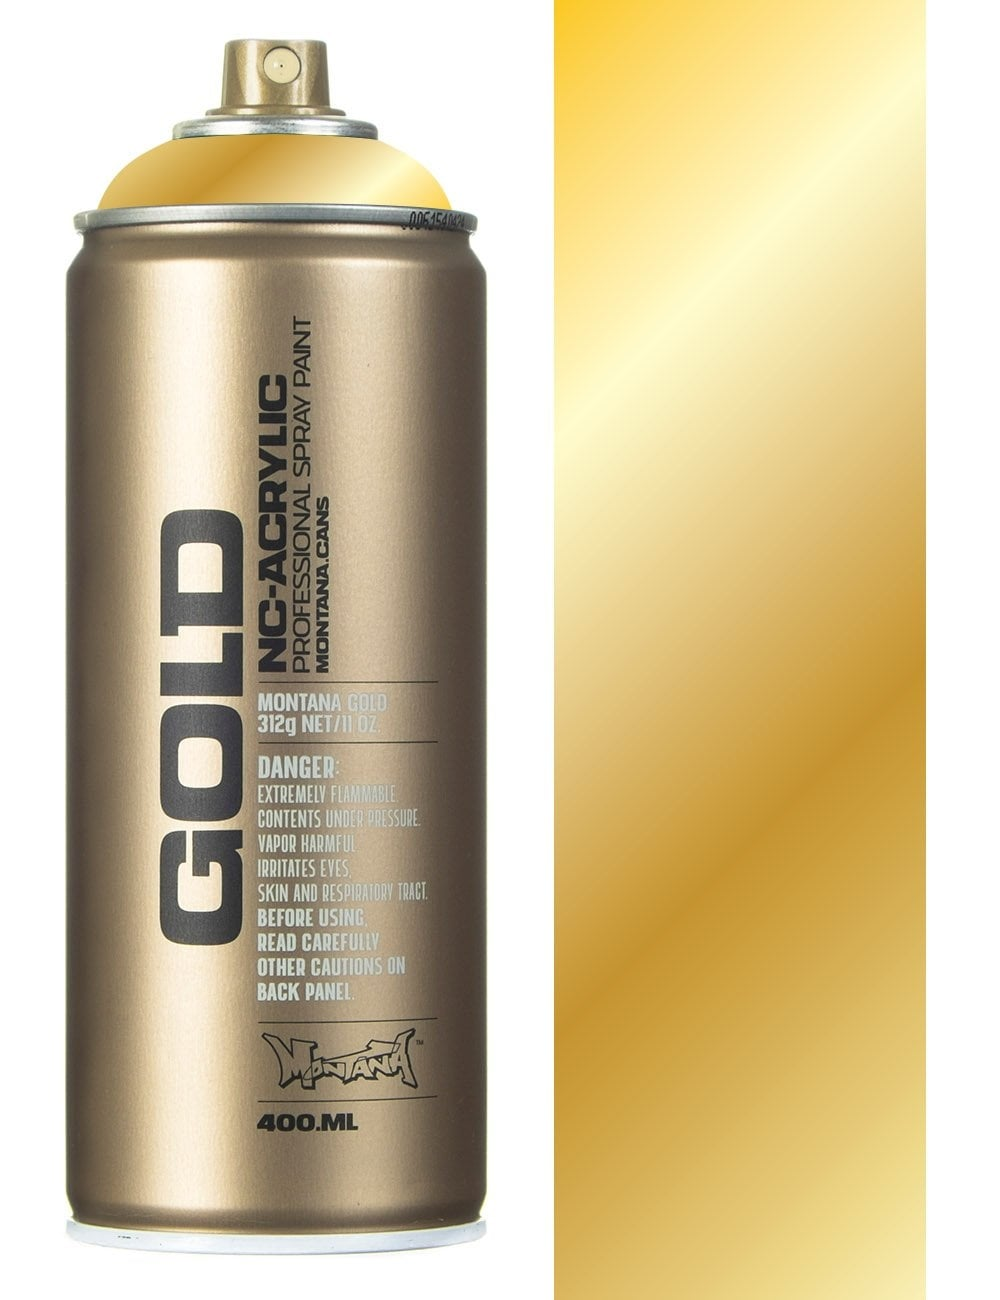 gold chrome spray paint 400ml spray paint supplies. Black Bedroom Furniture Sets. Home Design Ideas